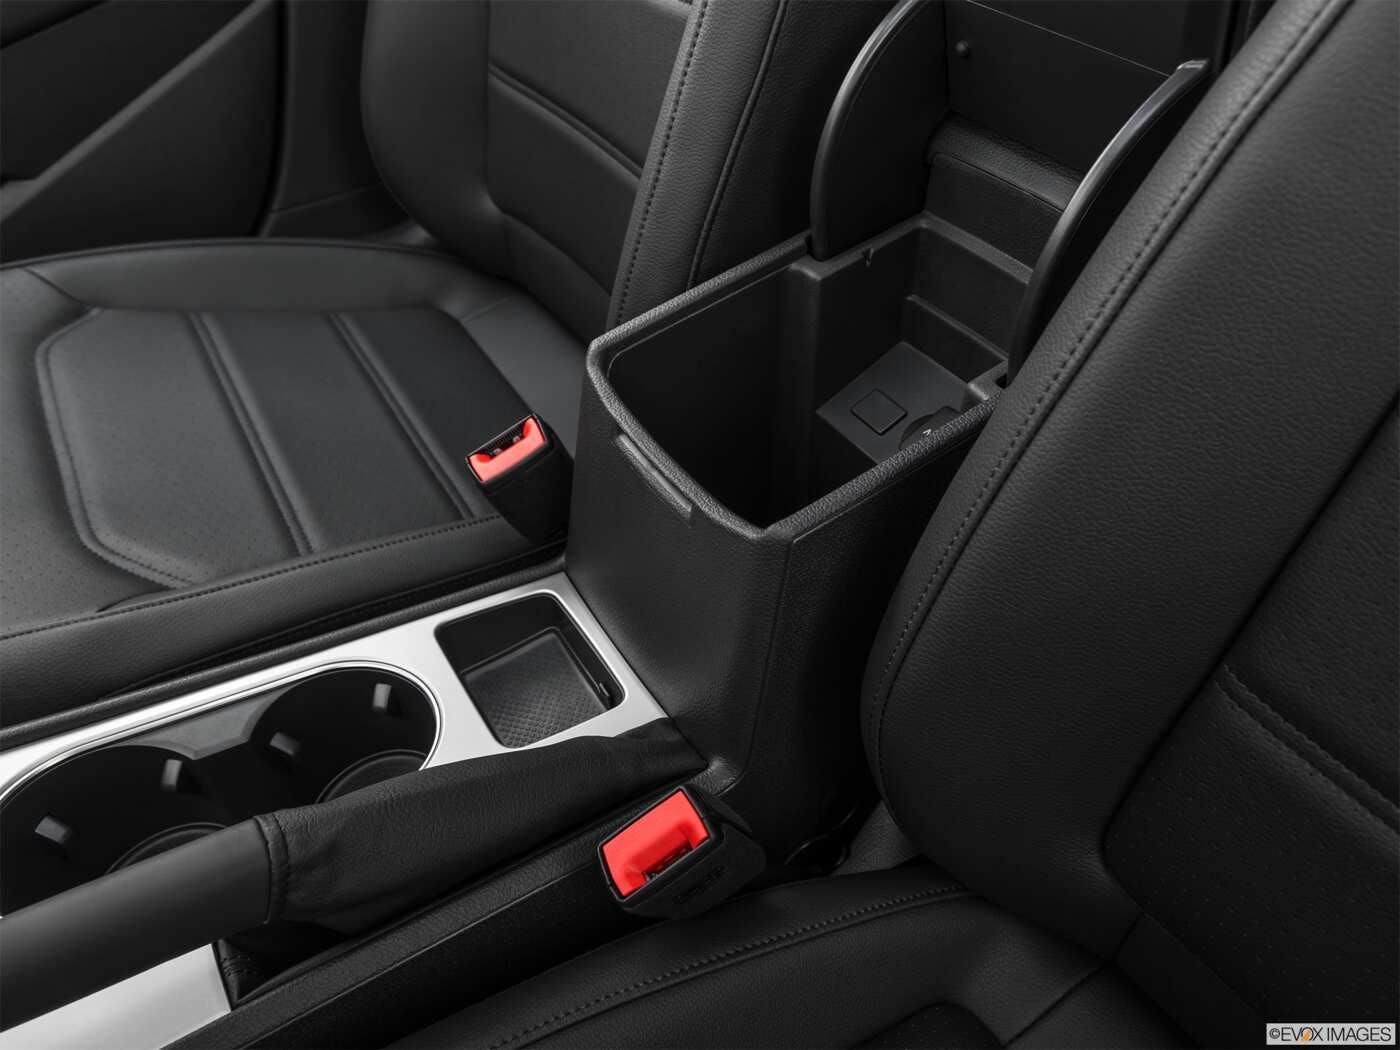 2019 Volkswagen Passat Prices Reviews Incentives Truecar 2005 Kia Sorento Wiring System Front Center Divider